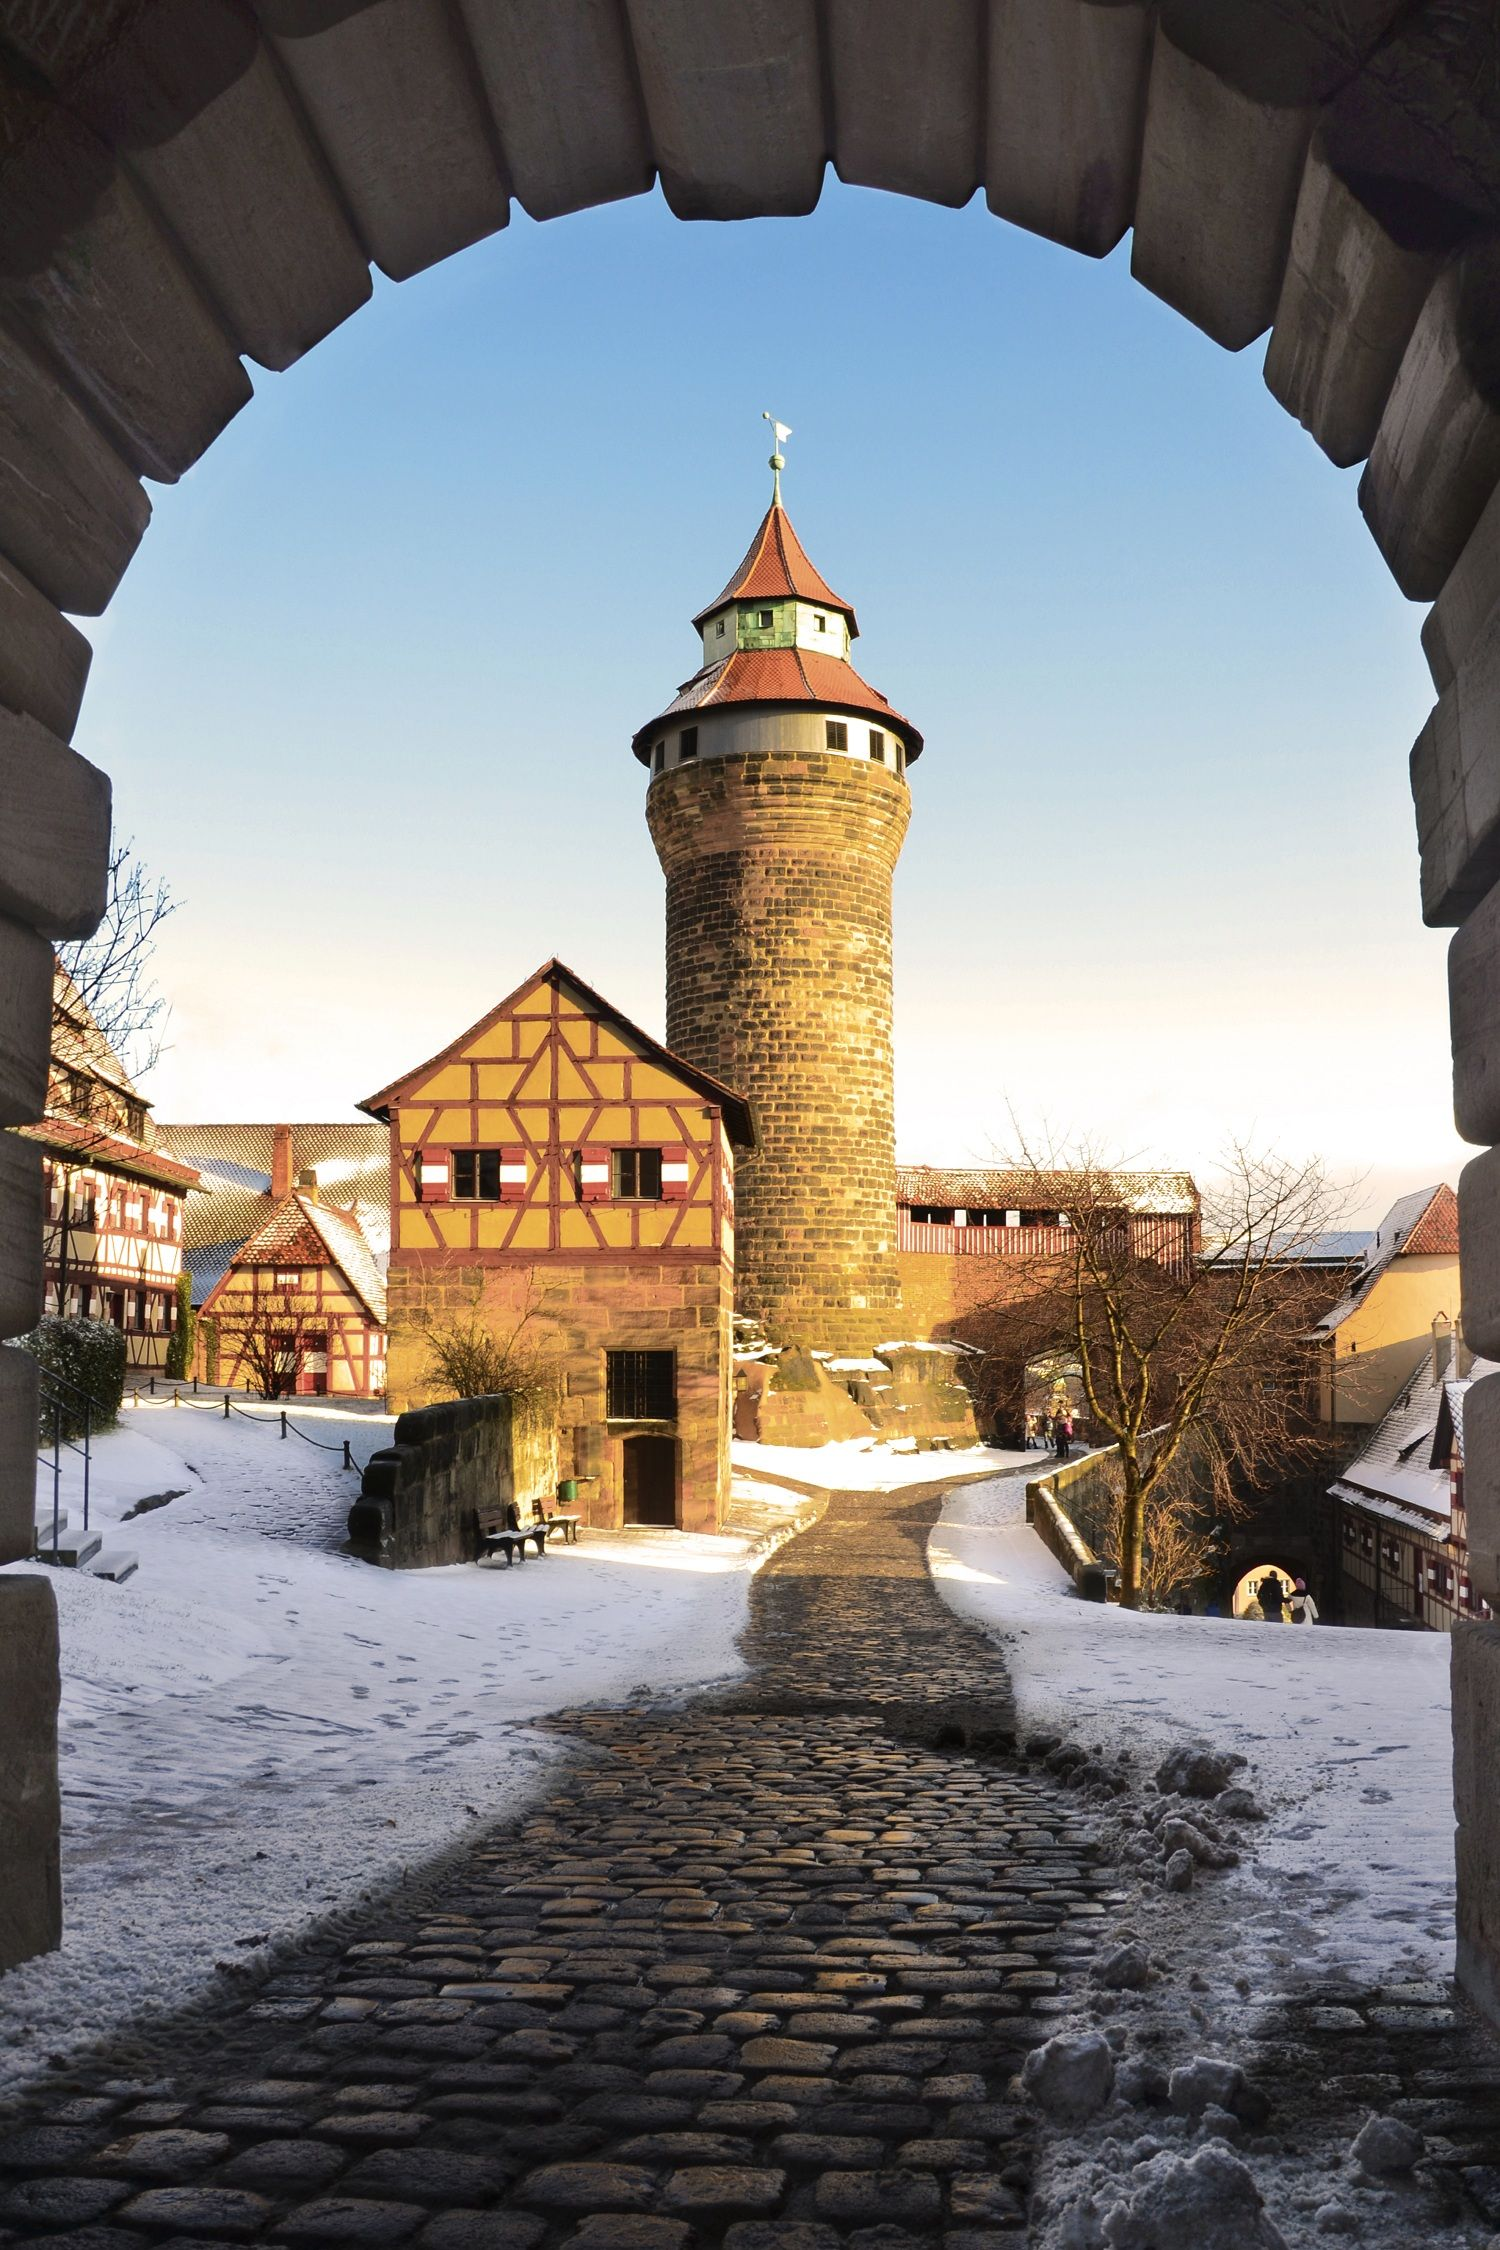 German Rail Passes Bahn Unlimited Train Travel In Germany Germany Castles Germany Travel European Castles